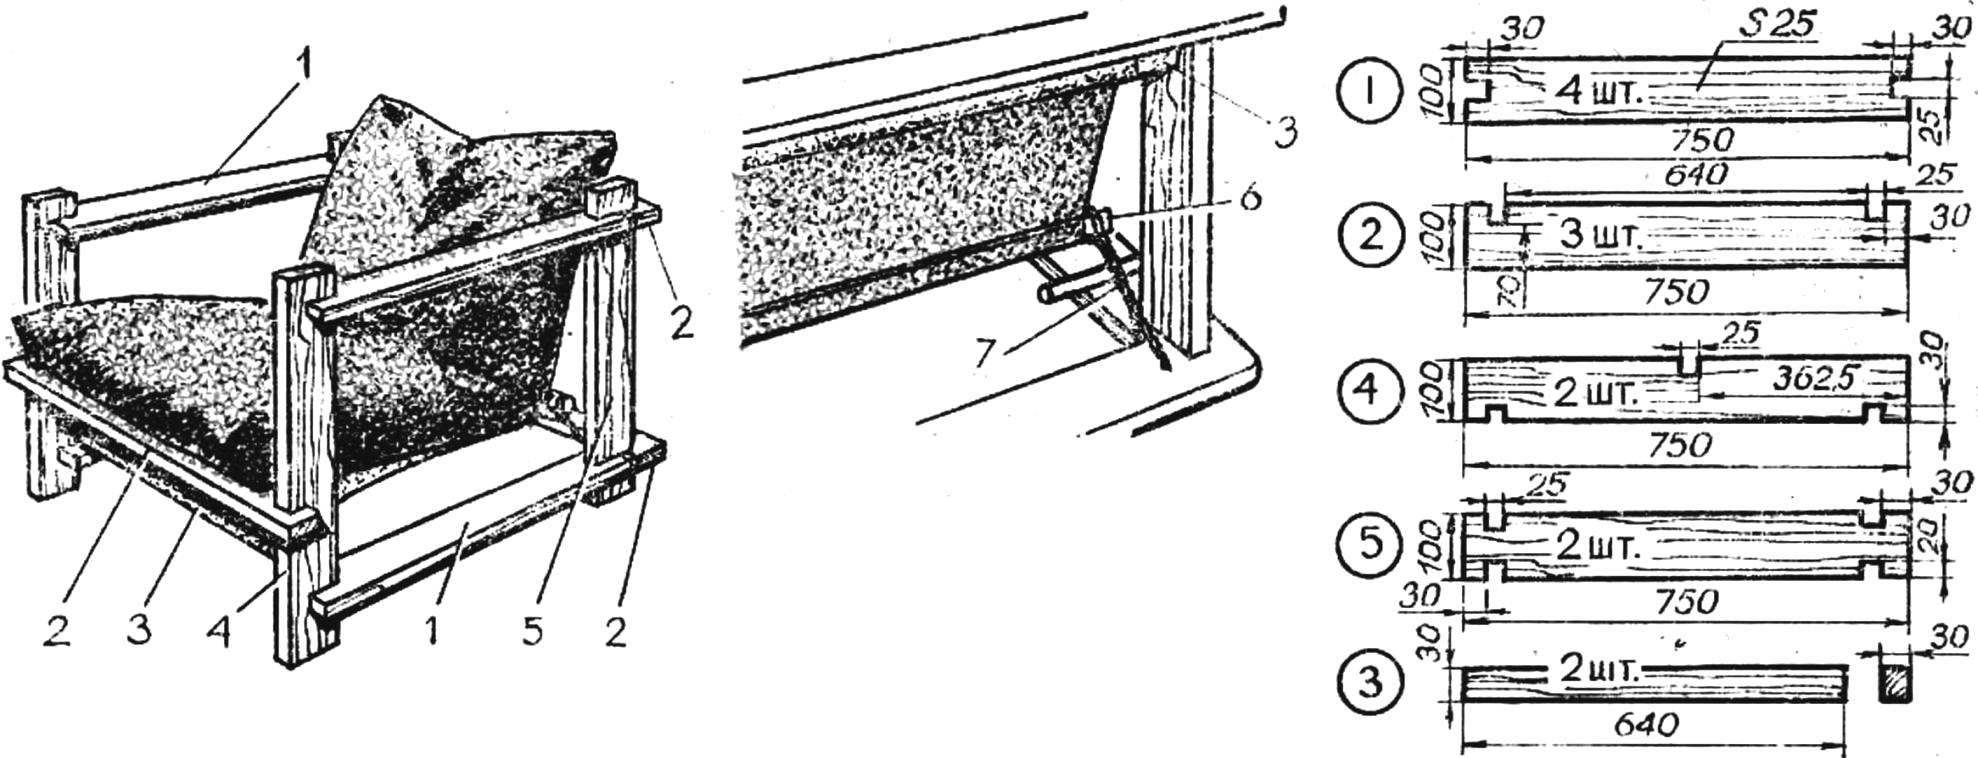 Рис. 2. Рамочное кресло с мягкими подушками